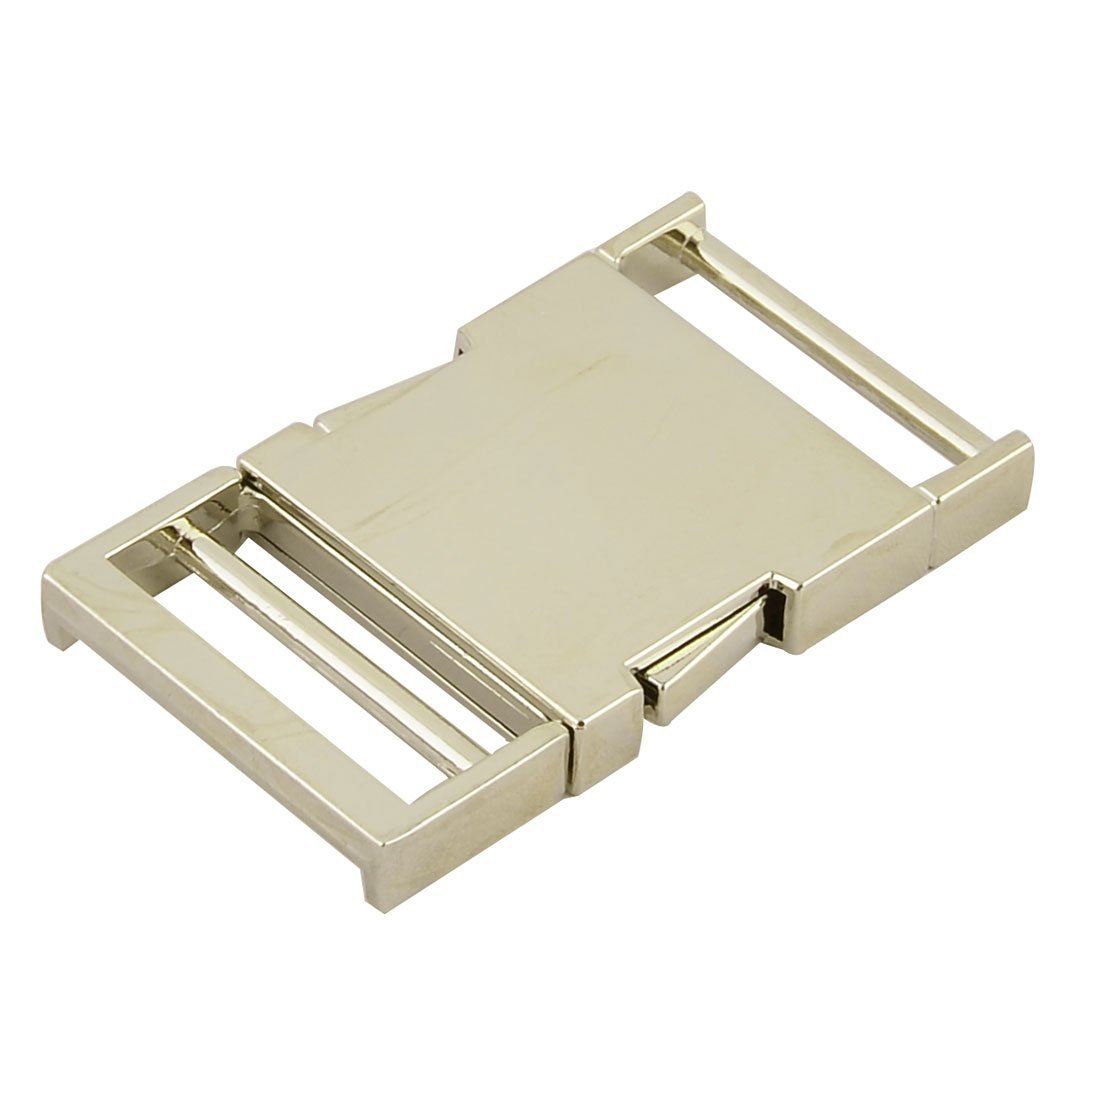 EbuyChX Metal Flat Belt strap Bag Side Quick Release mabaluktot 1.5 Inside Lapad Gold Tone